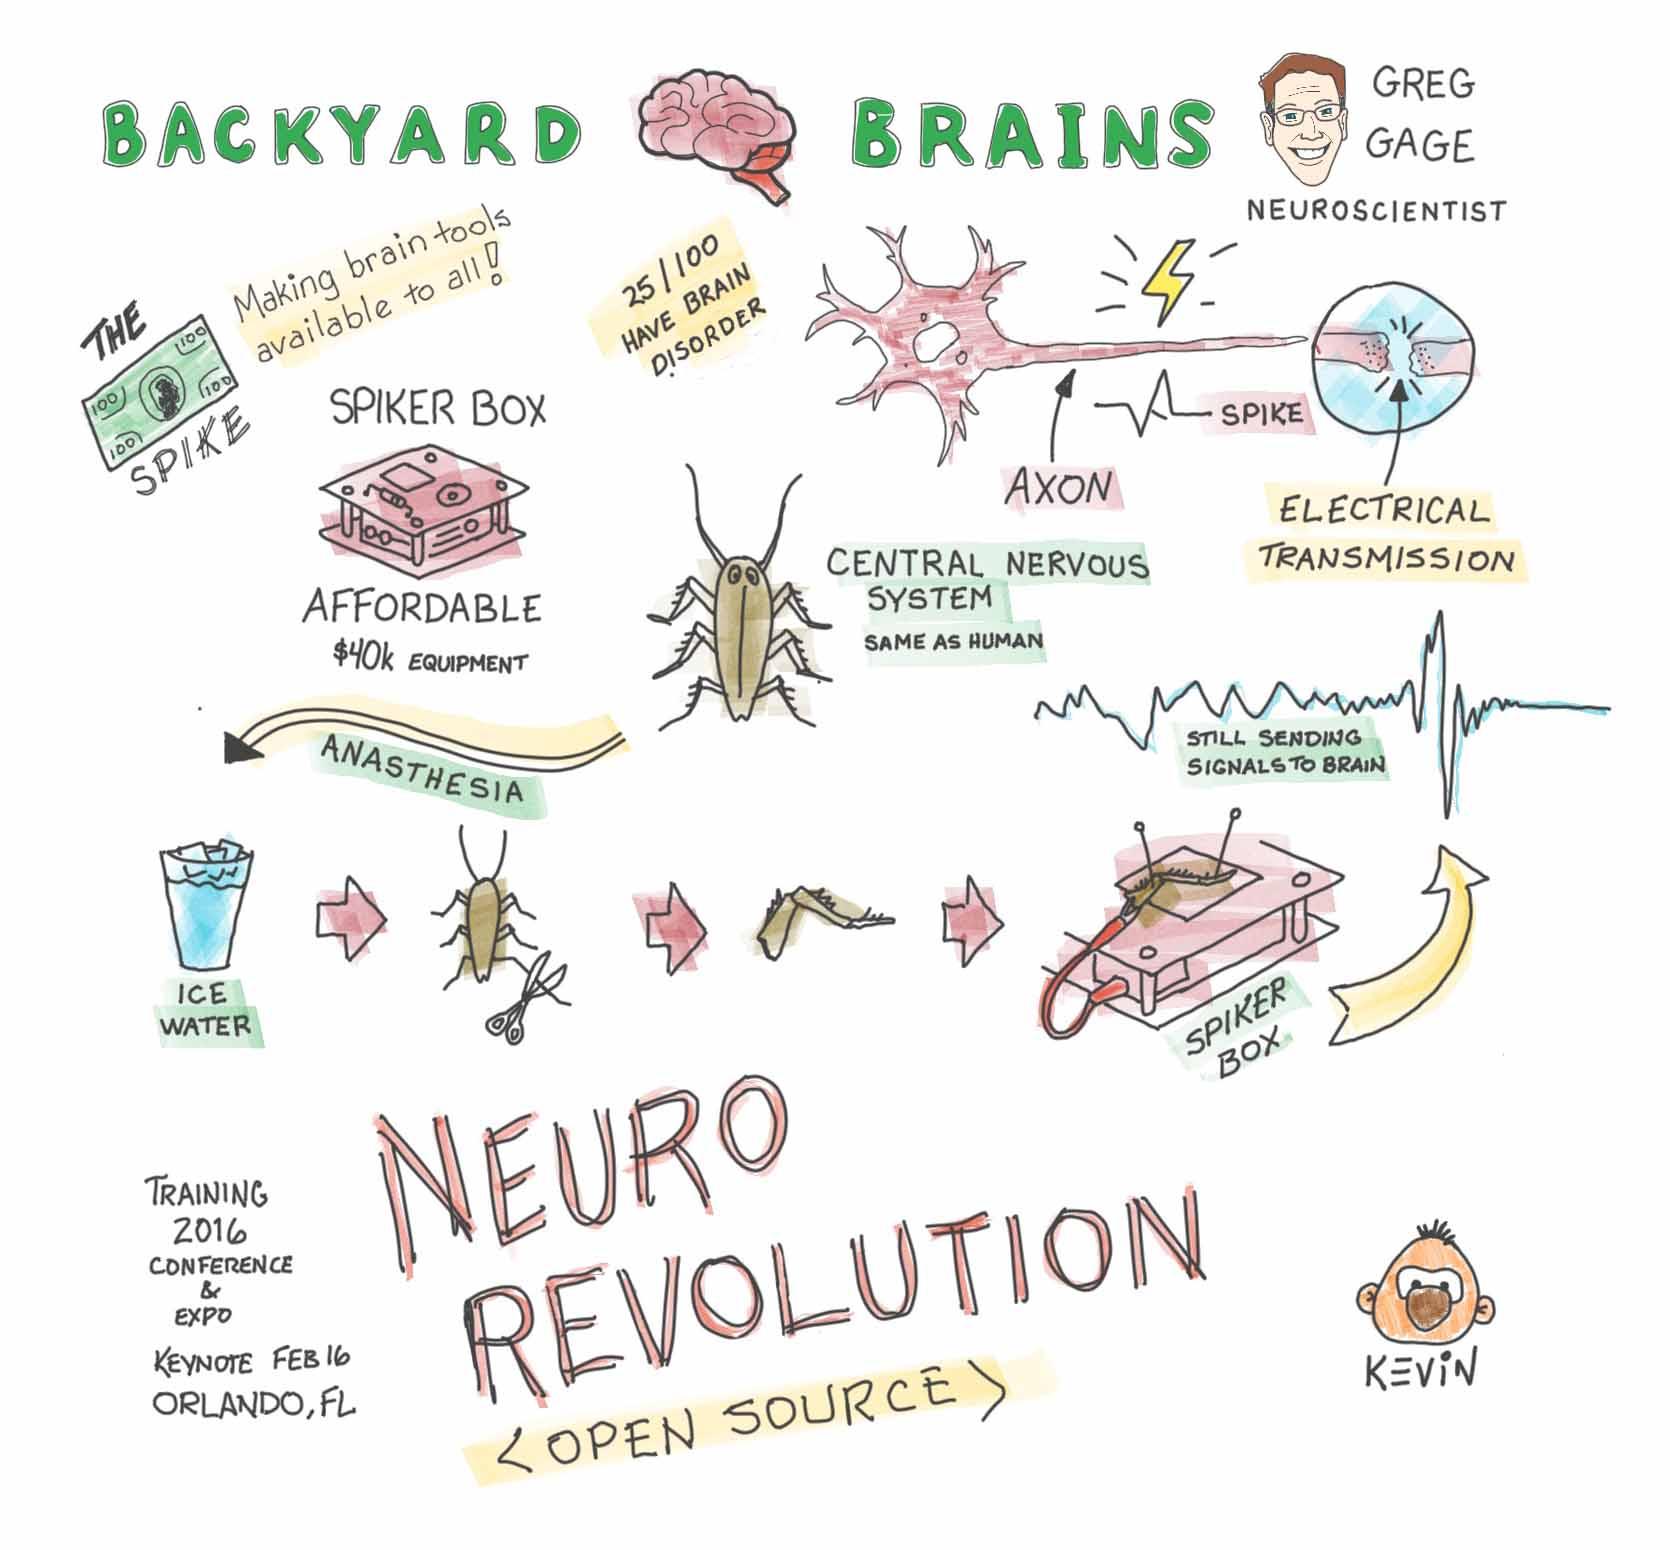 TM16_Backyard-Brains